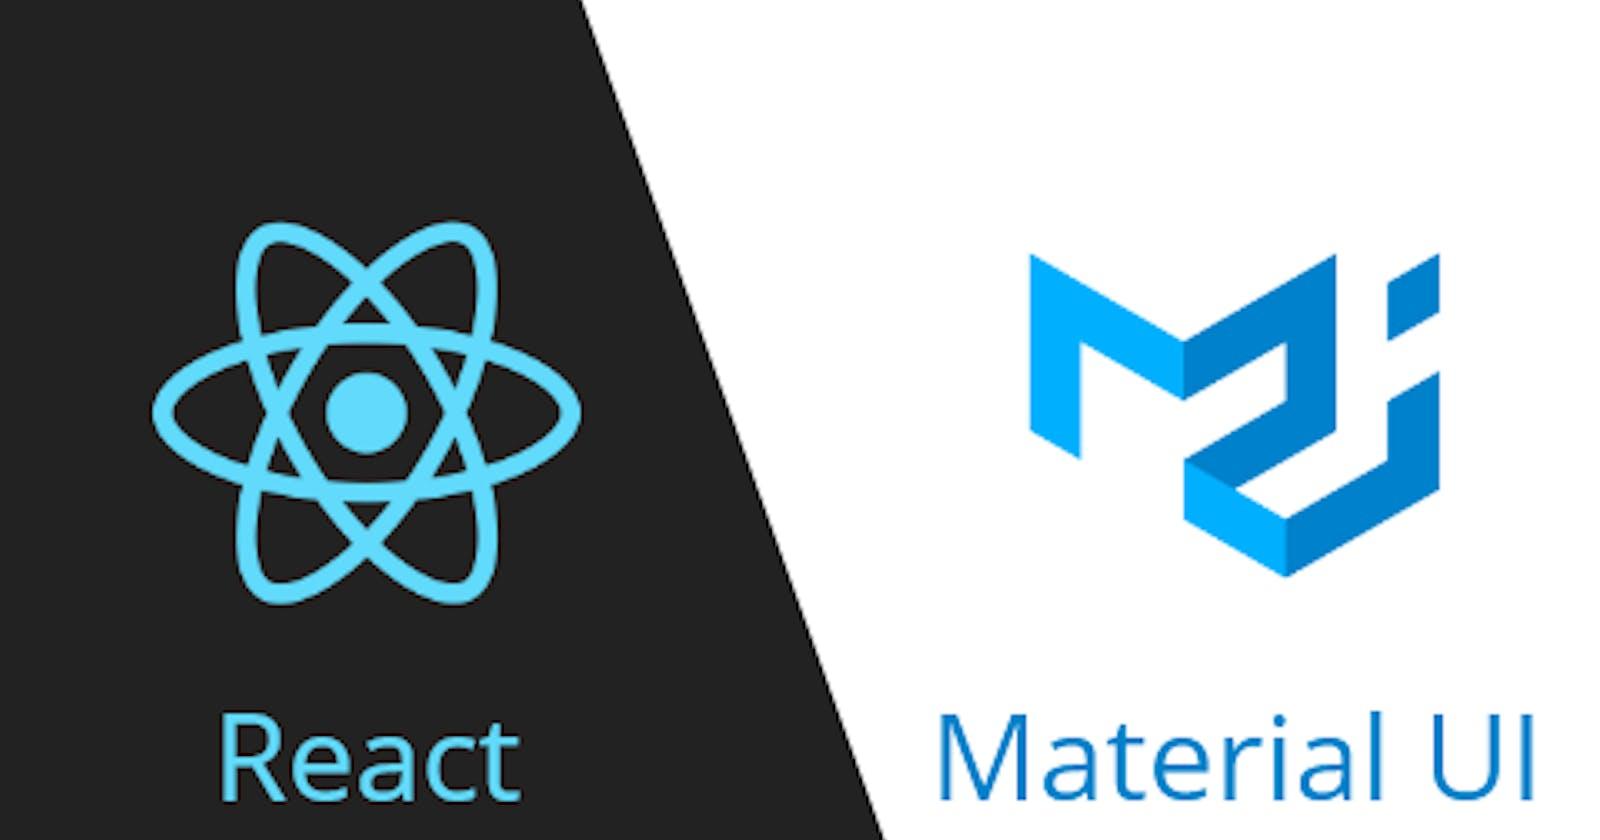 A Crash Course in Material-UI